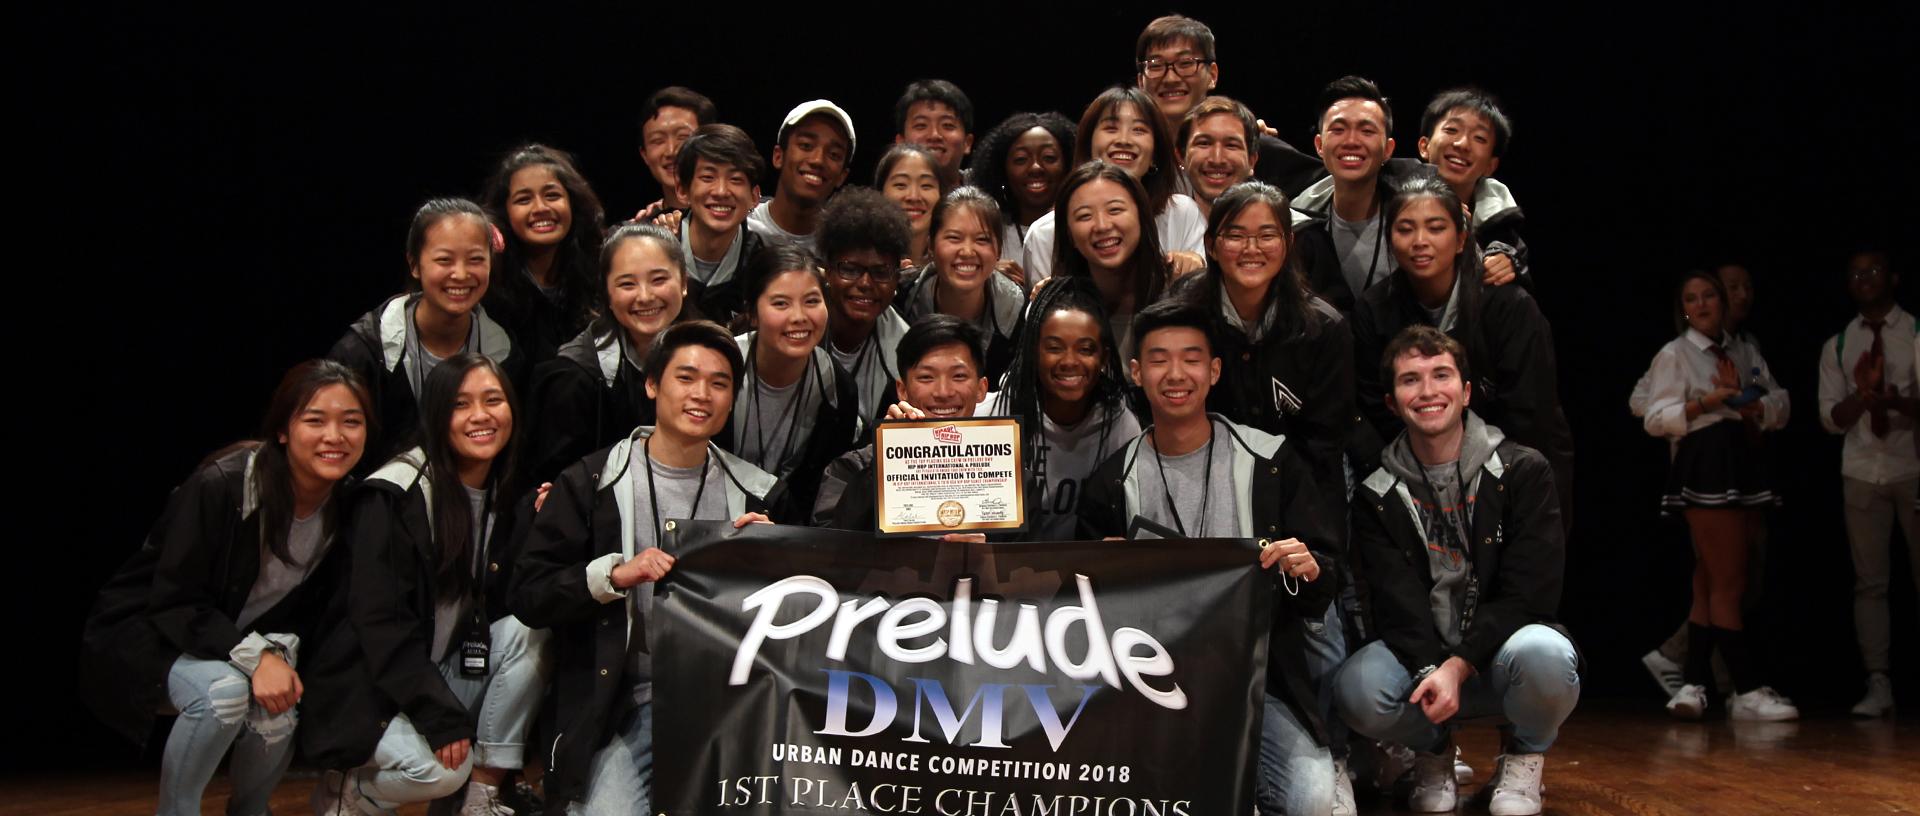 PRELUDE DMV 2018